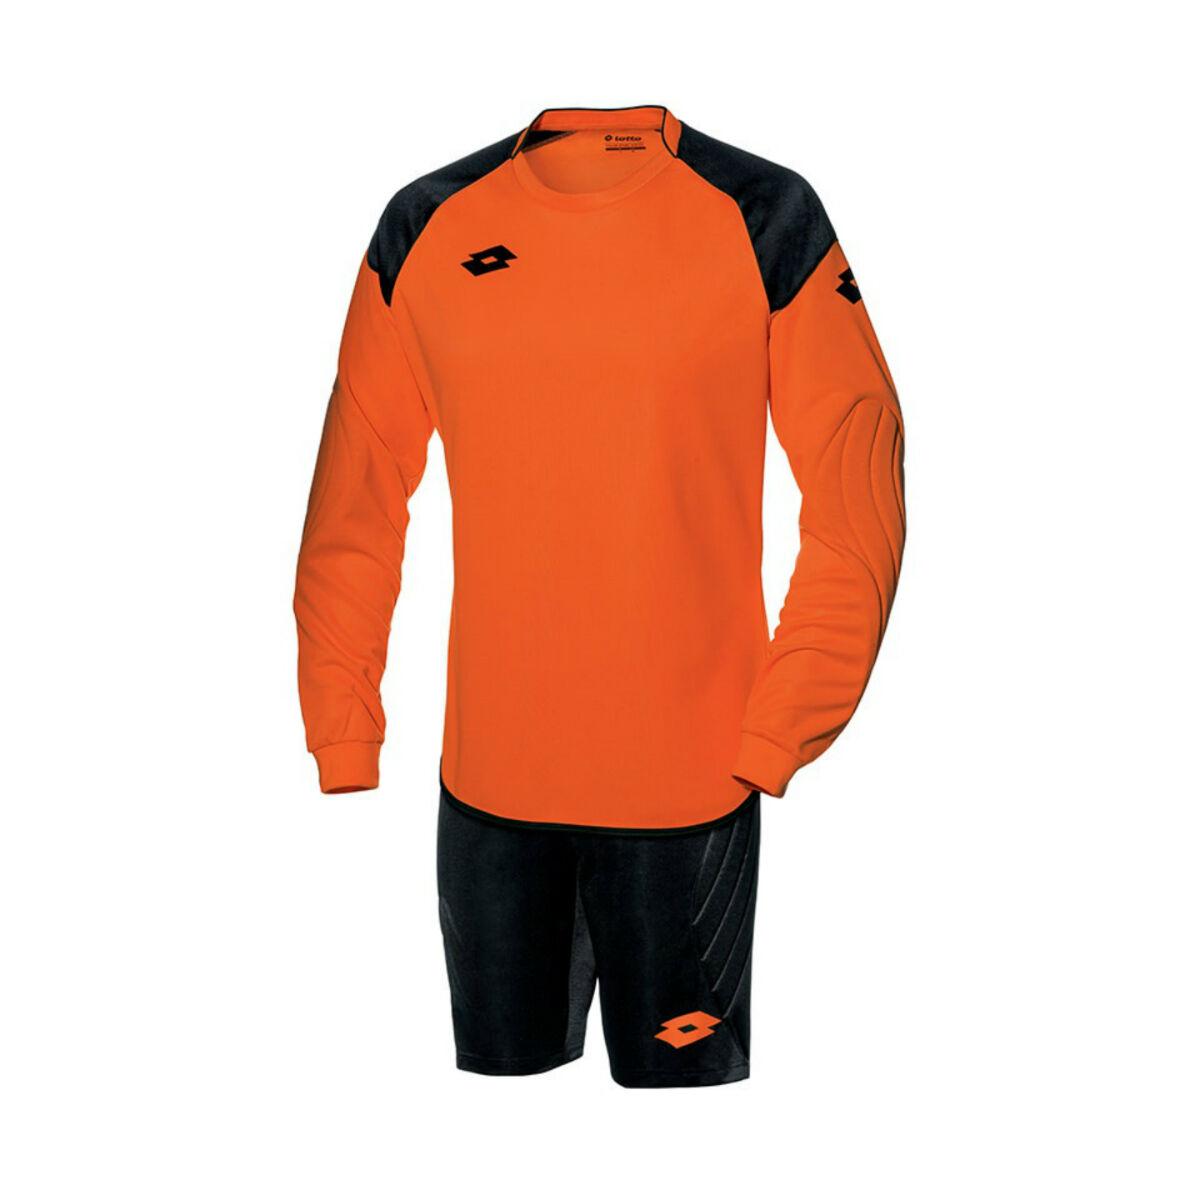 Lotto Goalkeeper Kit (Fluo Fanta / Black)